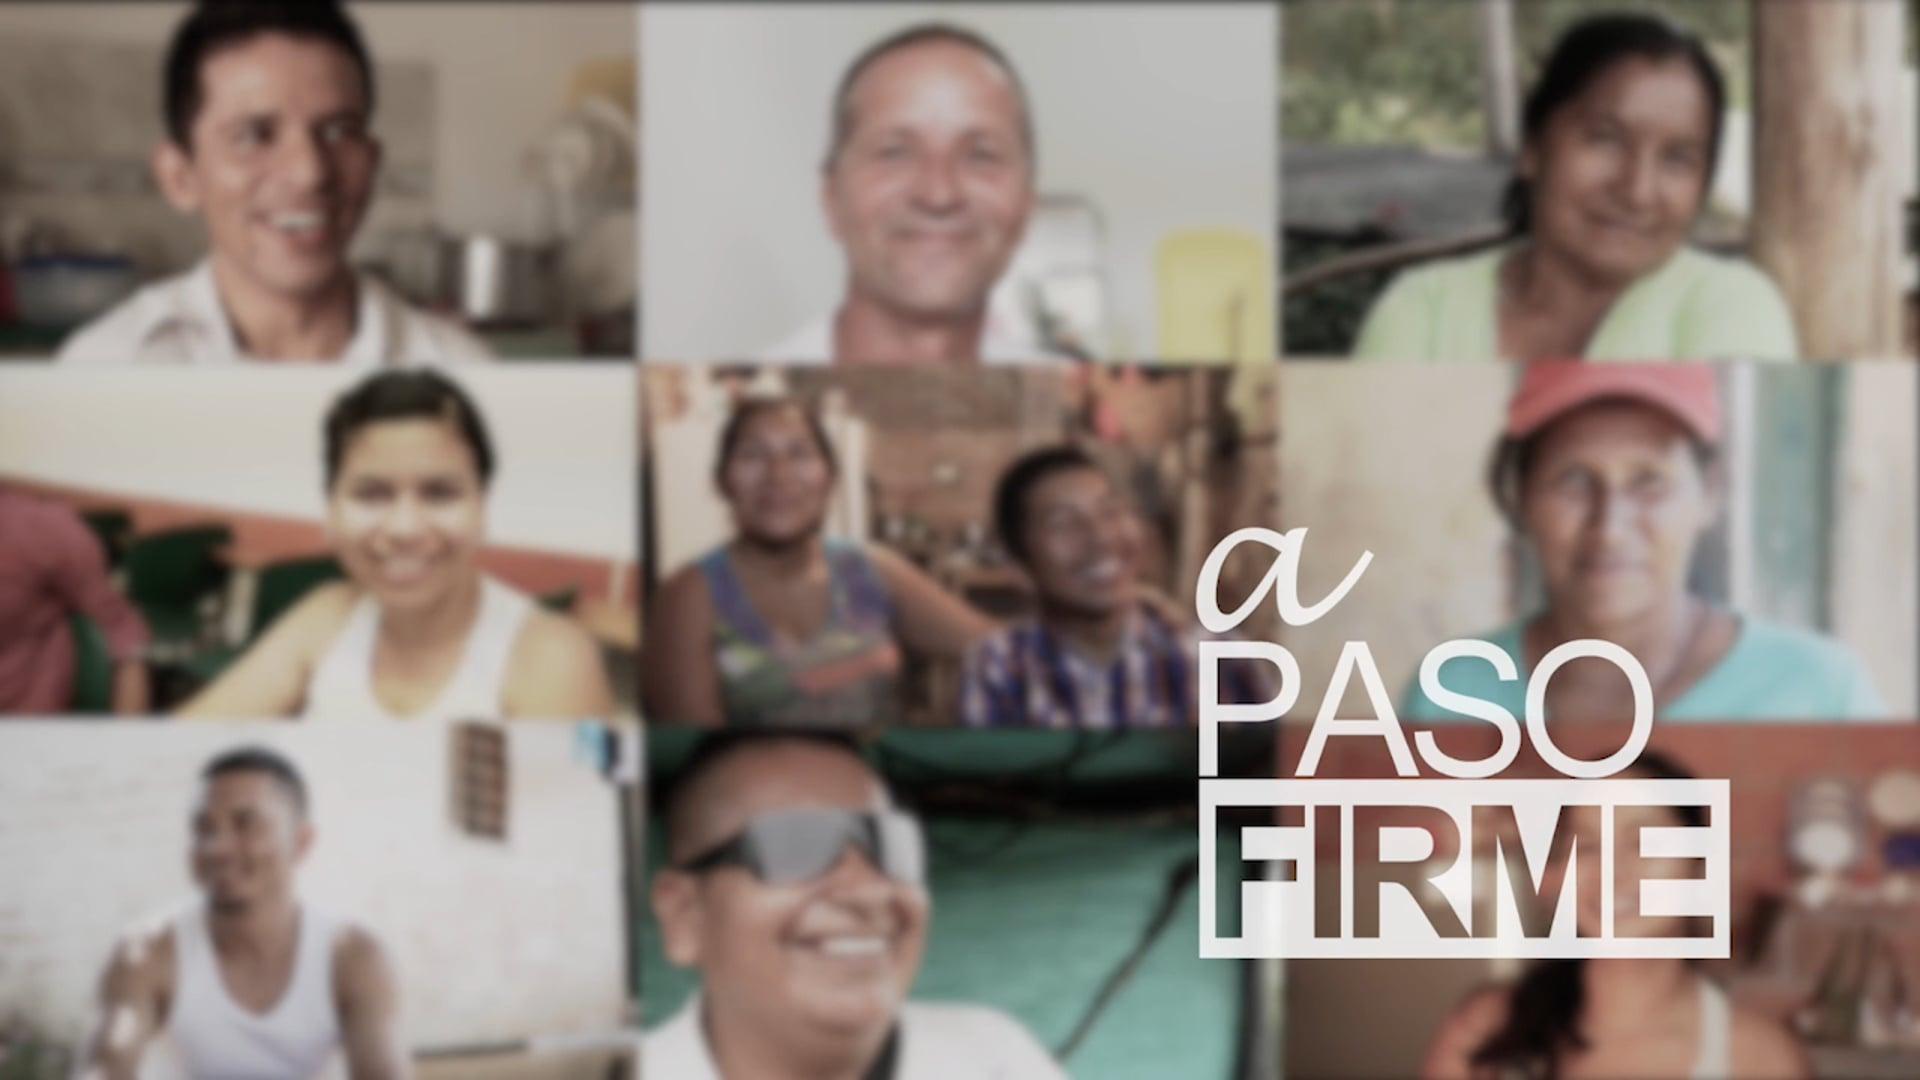 A PASO FIRME, documentary